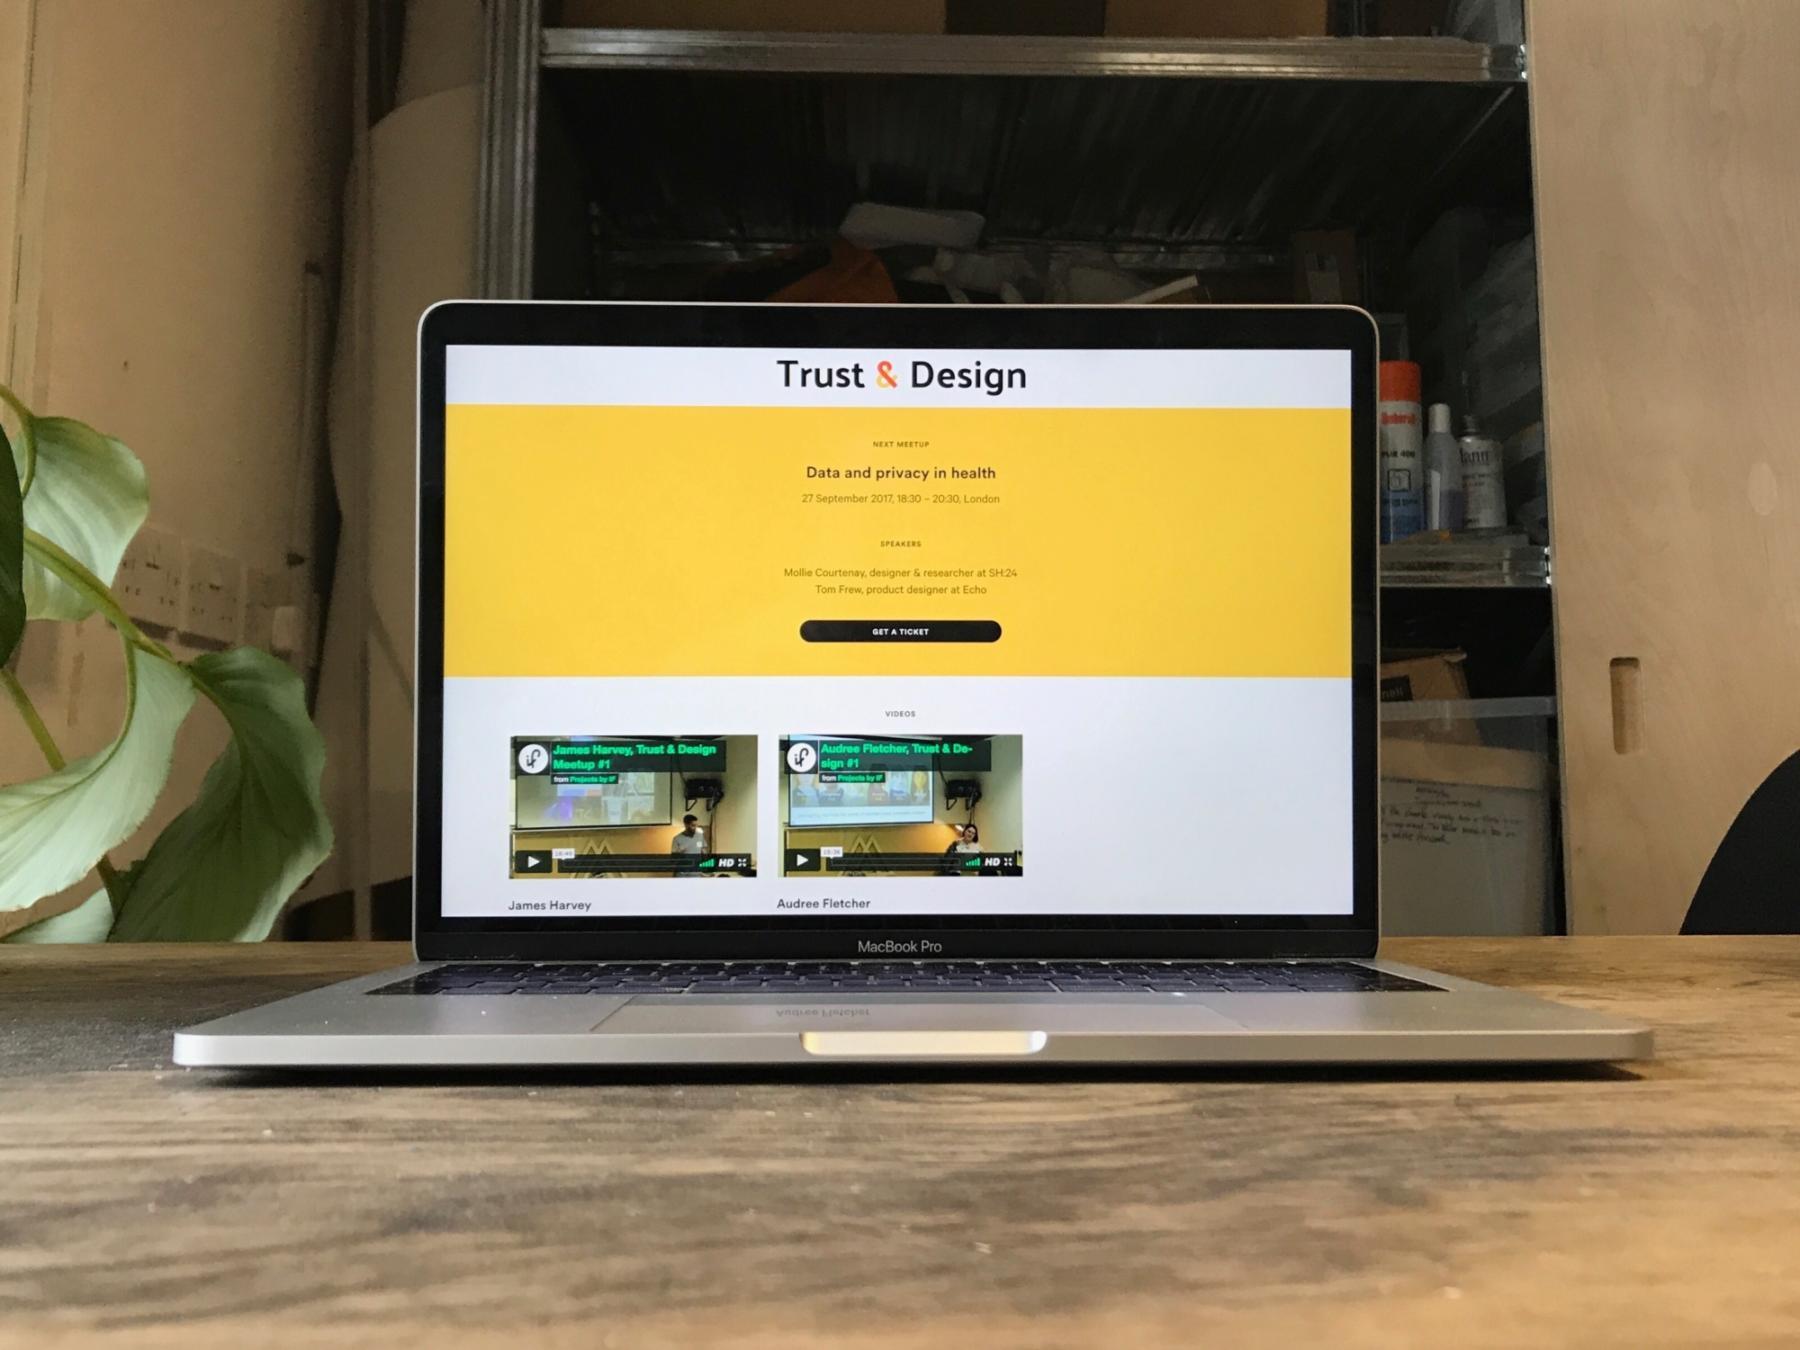 trustanddesign.projectsbyif.com